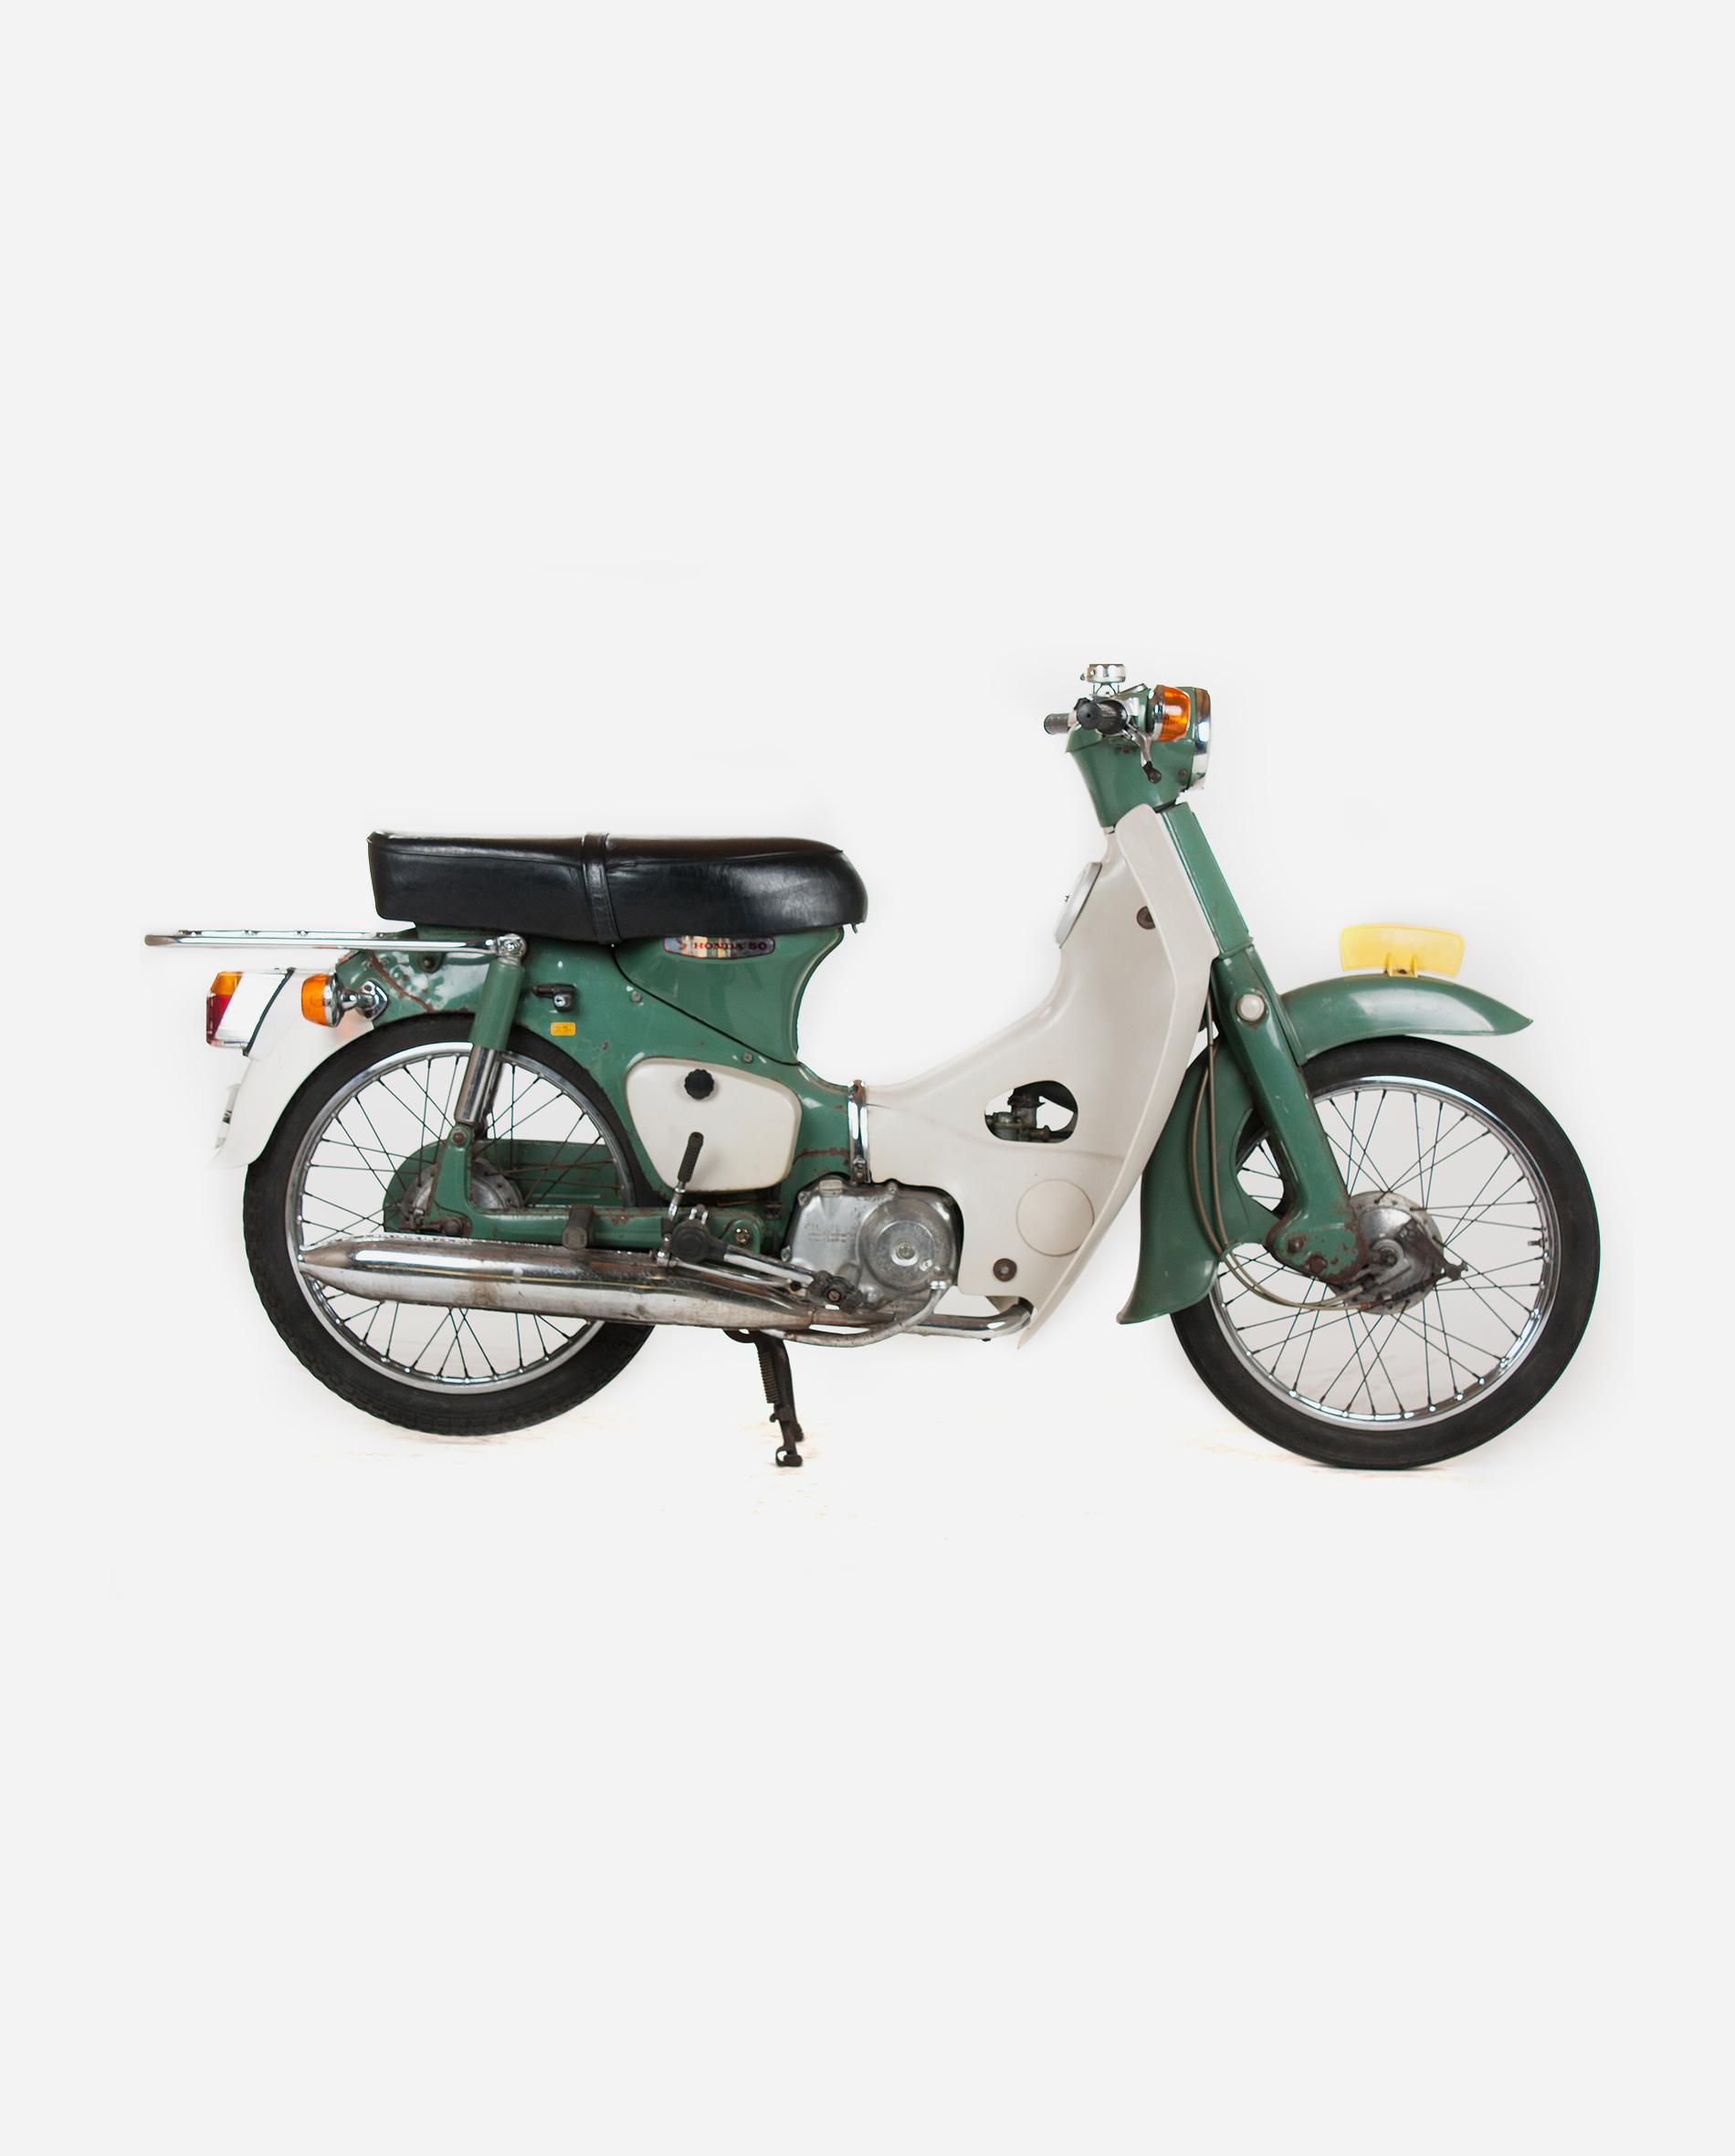 Honda-c50-whtiout-license-r · Fourstrokebarn